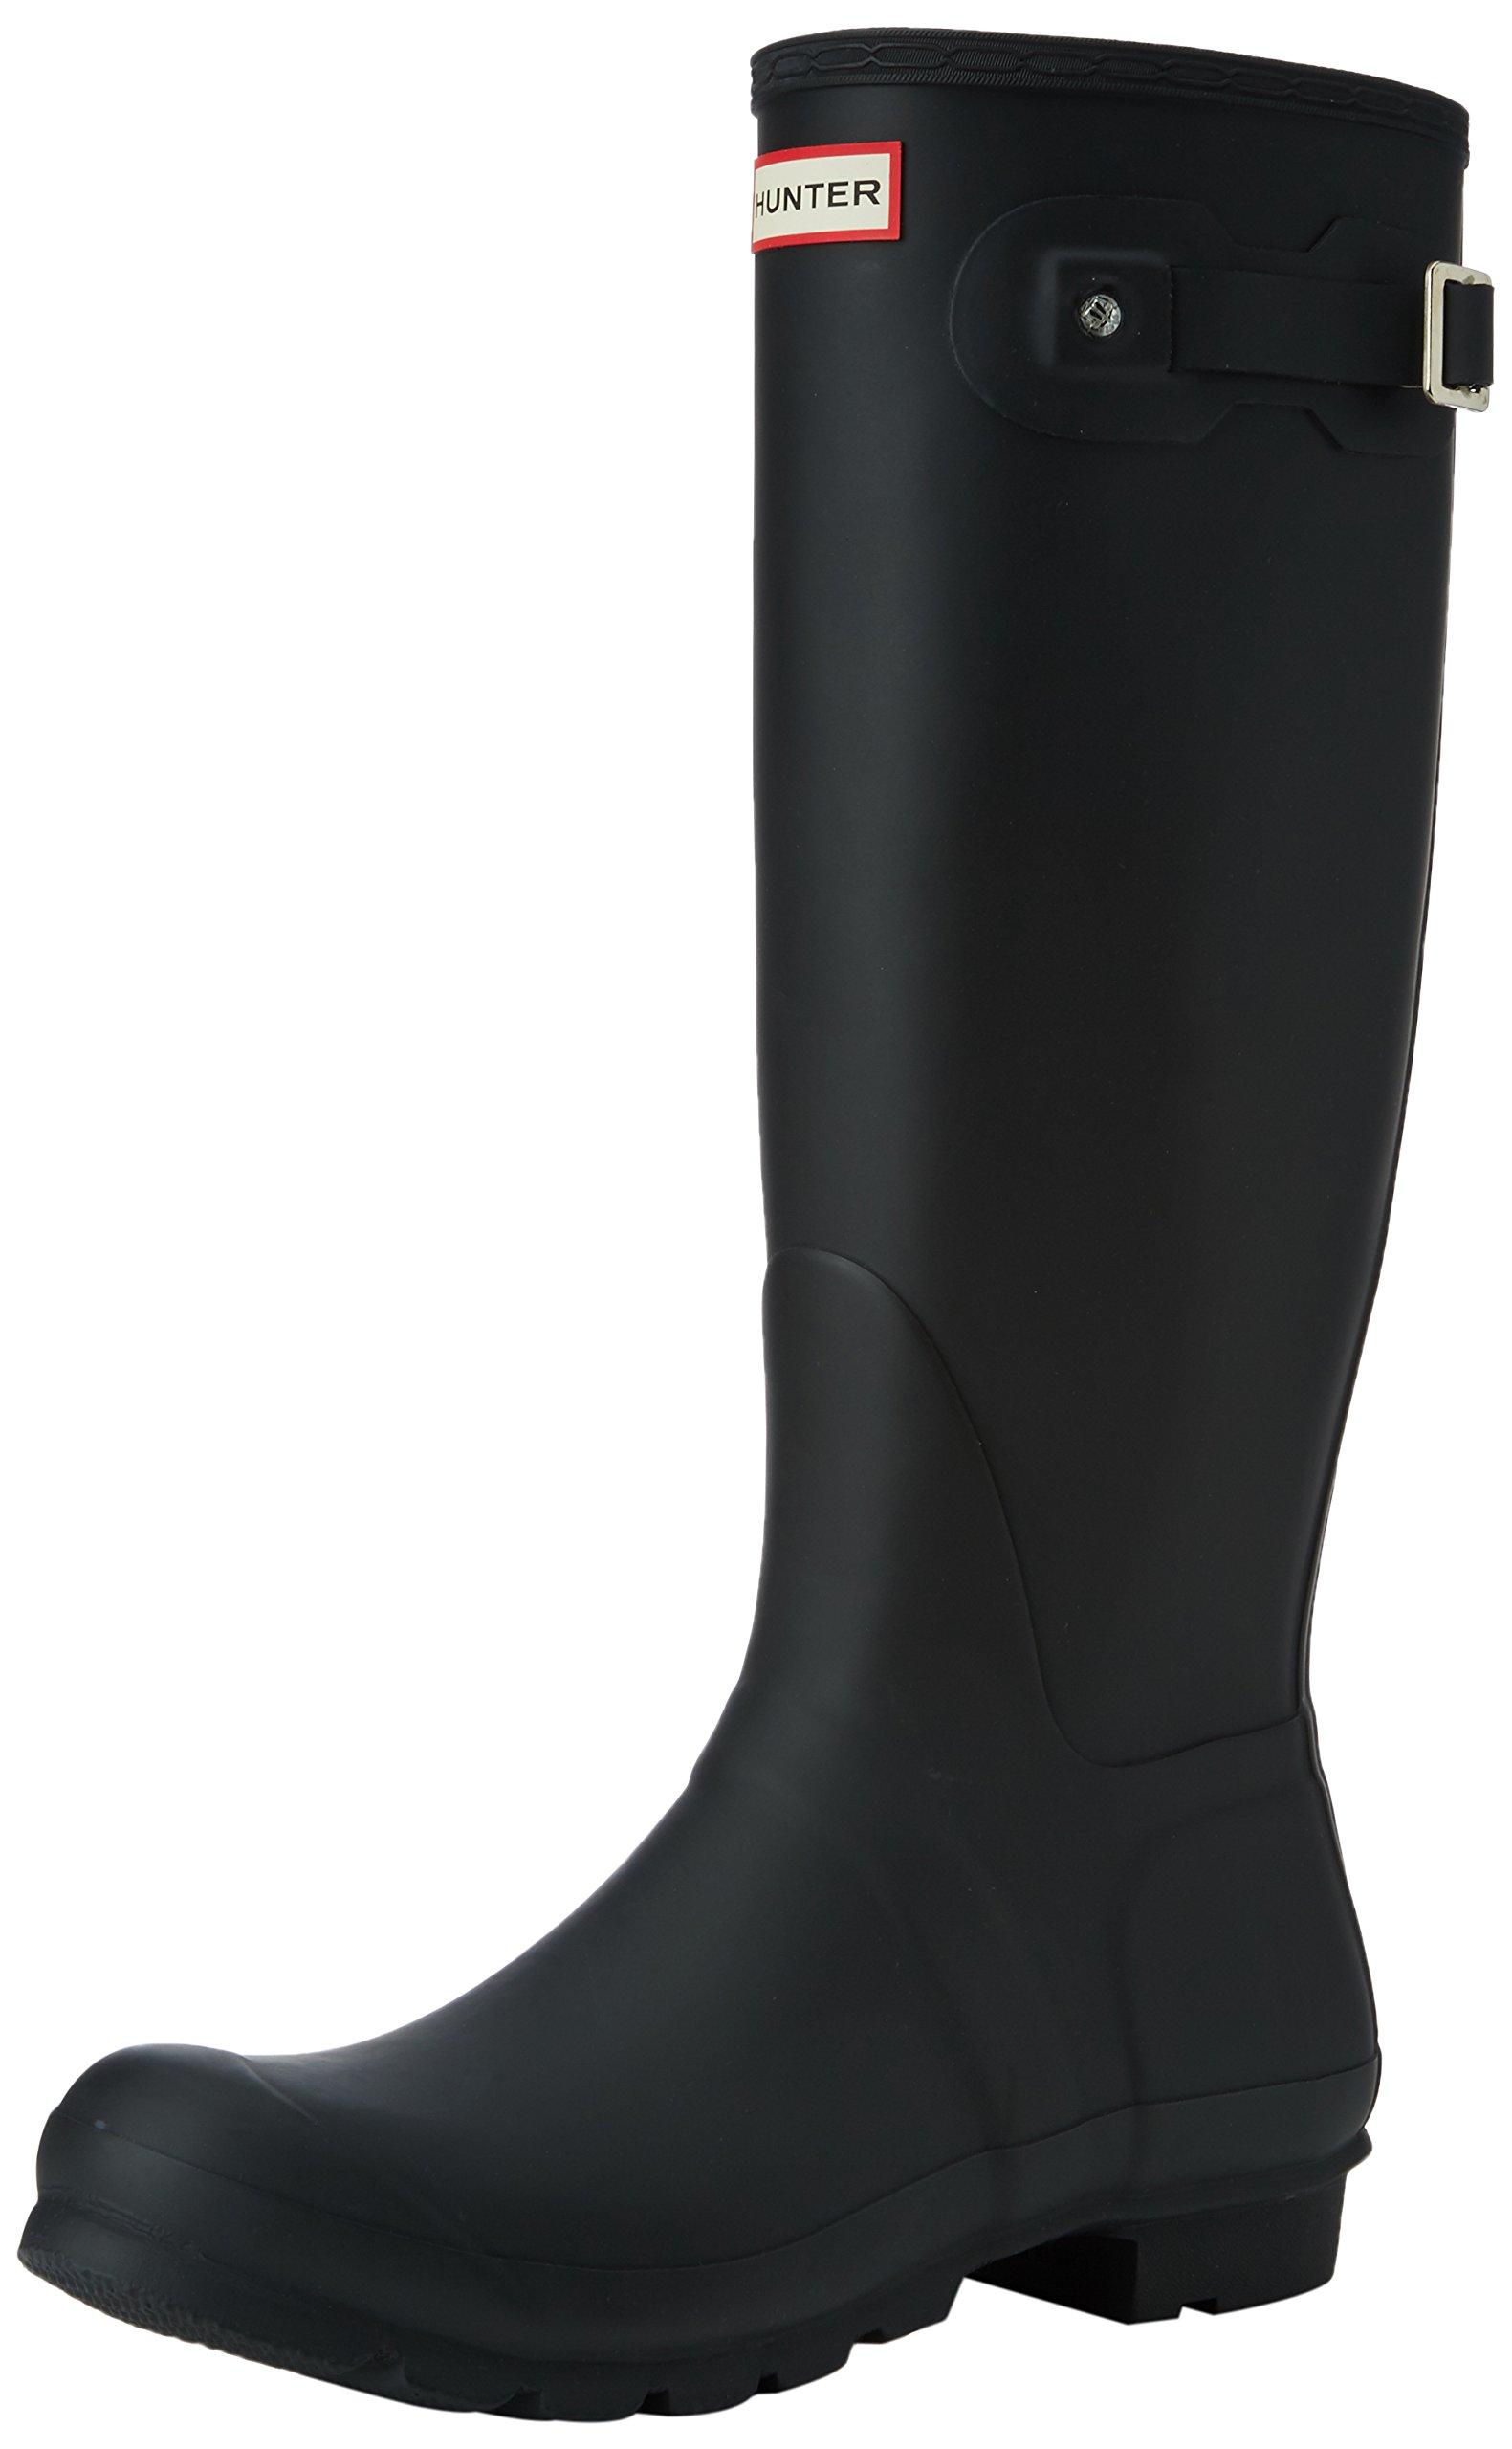 Hunter Women's Original Tall Snow Boot, Black, 8 M US